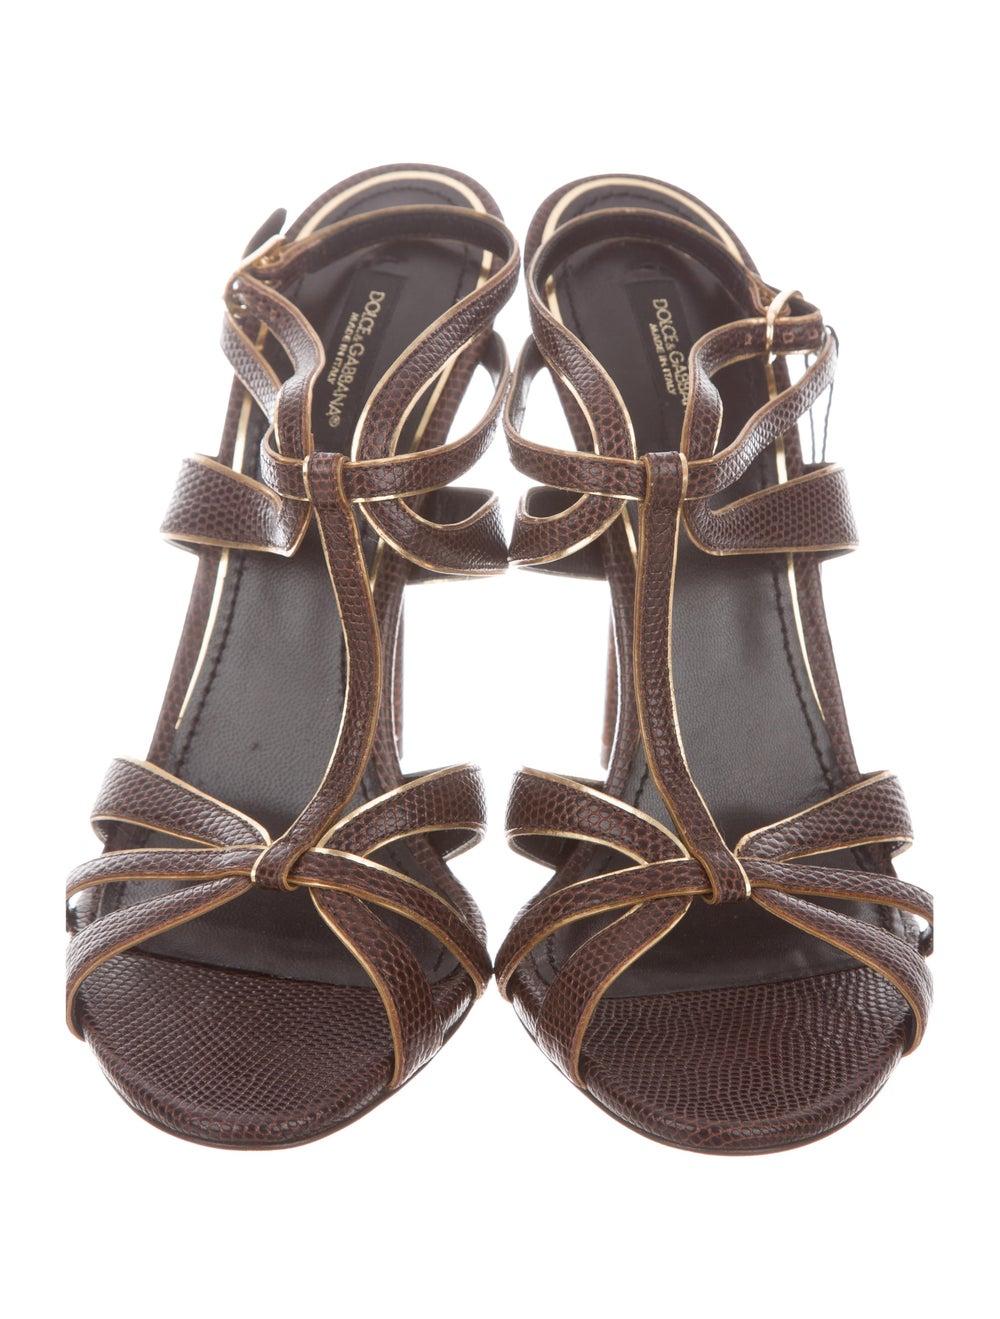 Dolce & Gabbana Lizard Strappy Sandals - image 3